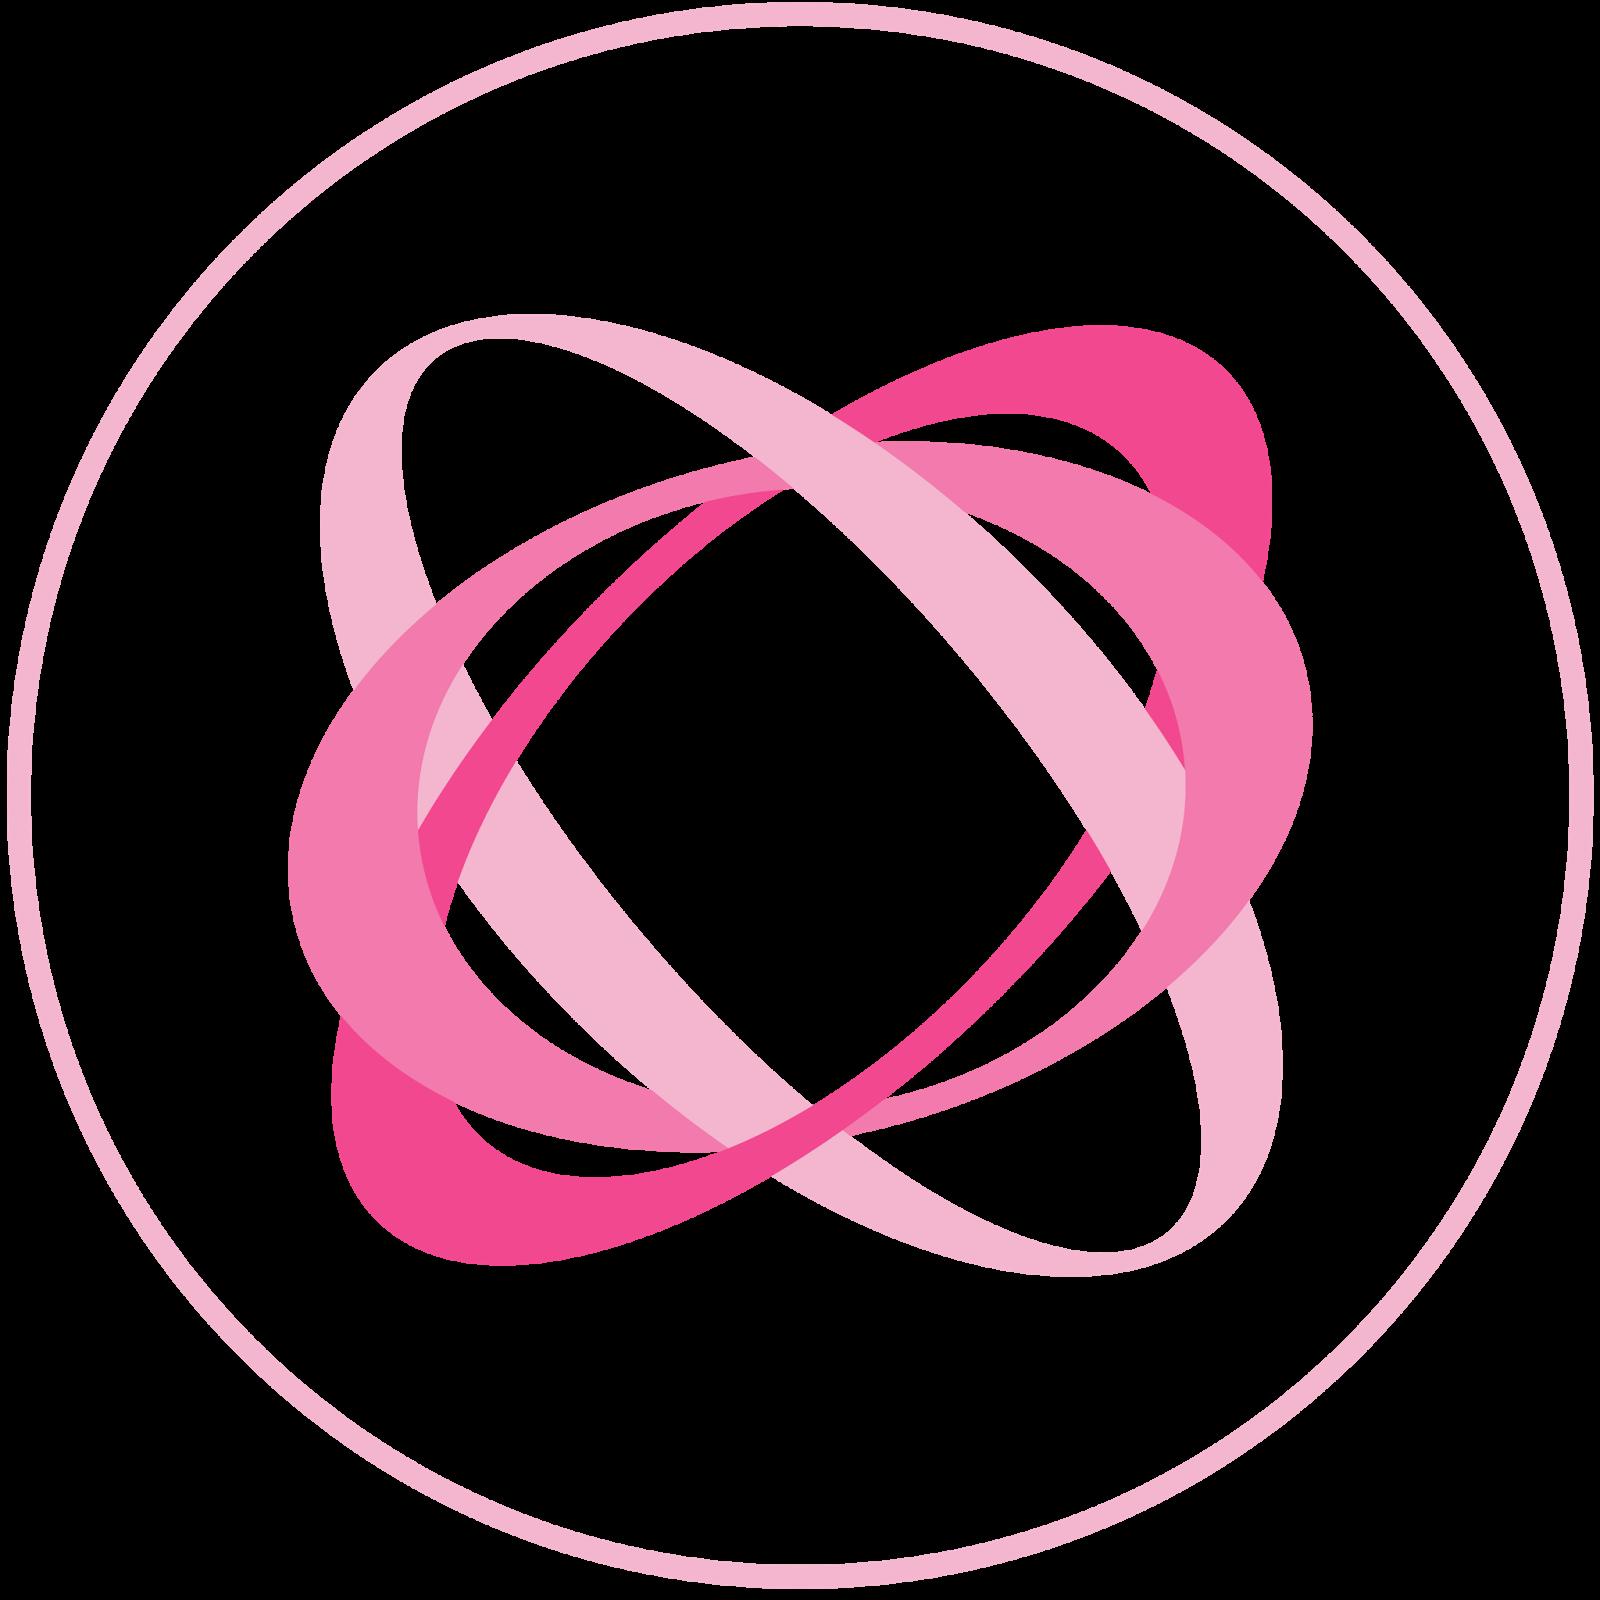 mindmeister logo